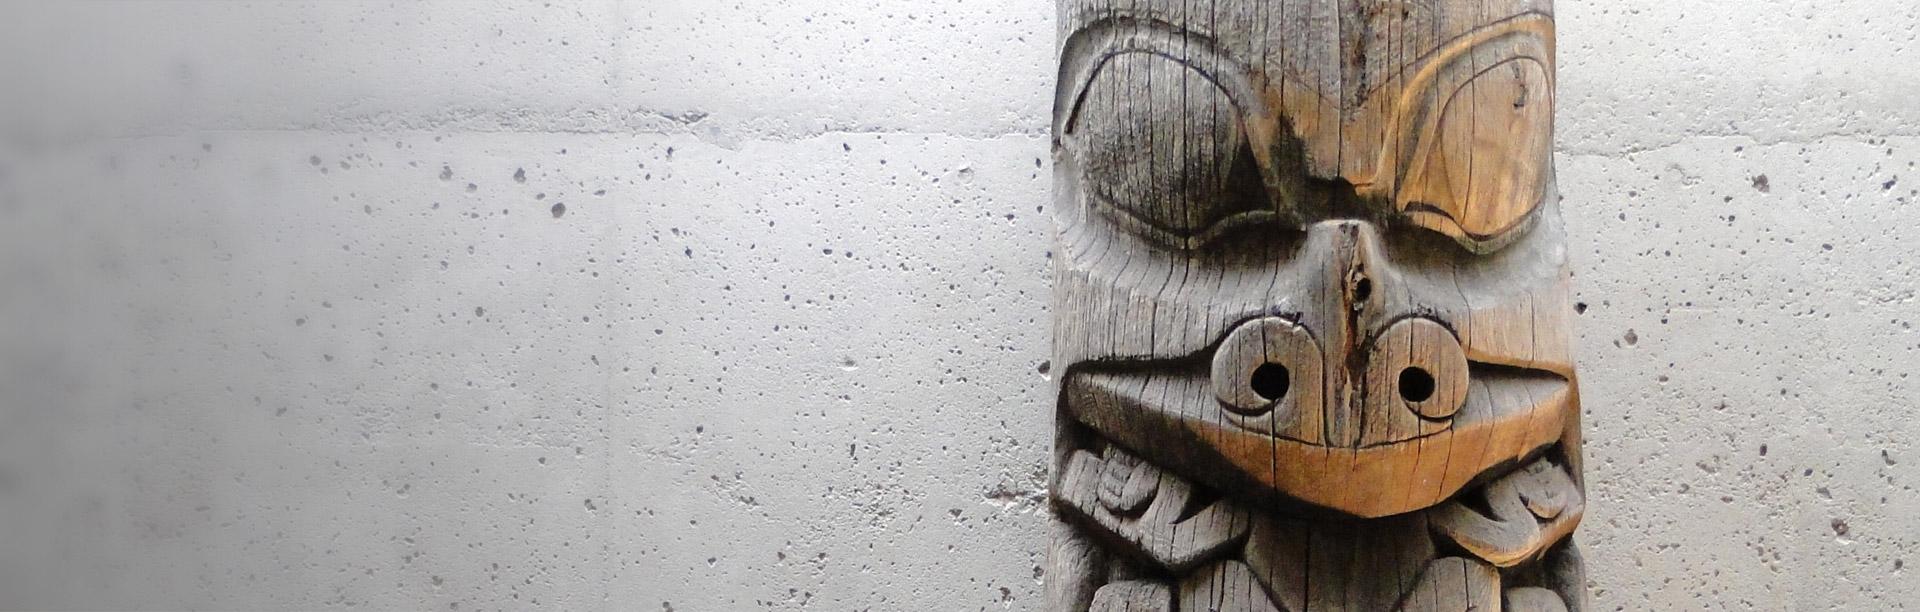 Totem pole in British Columbia